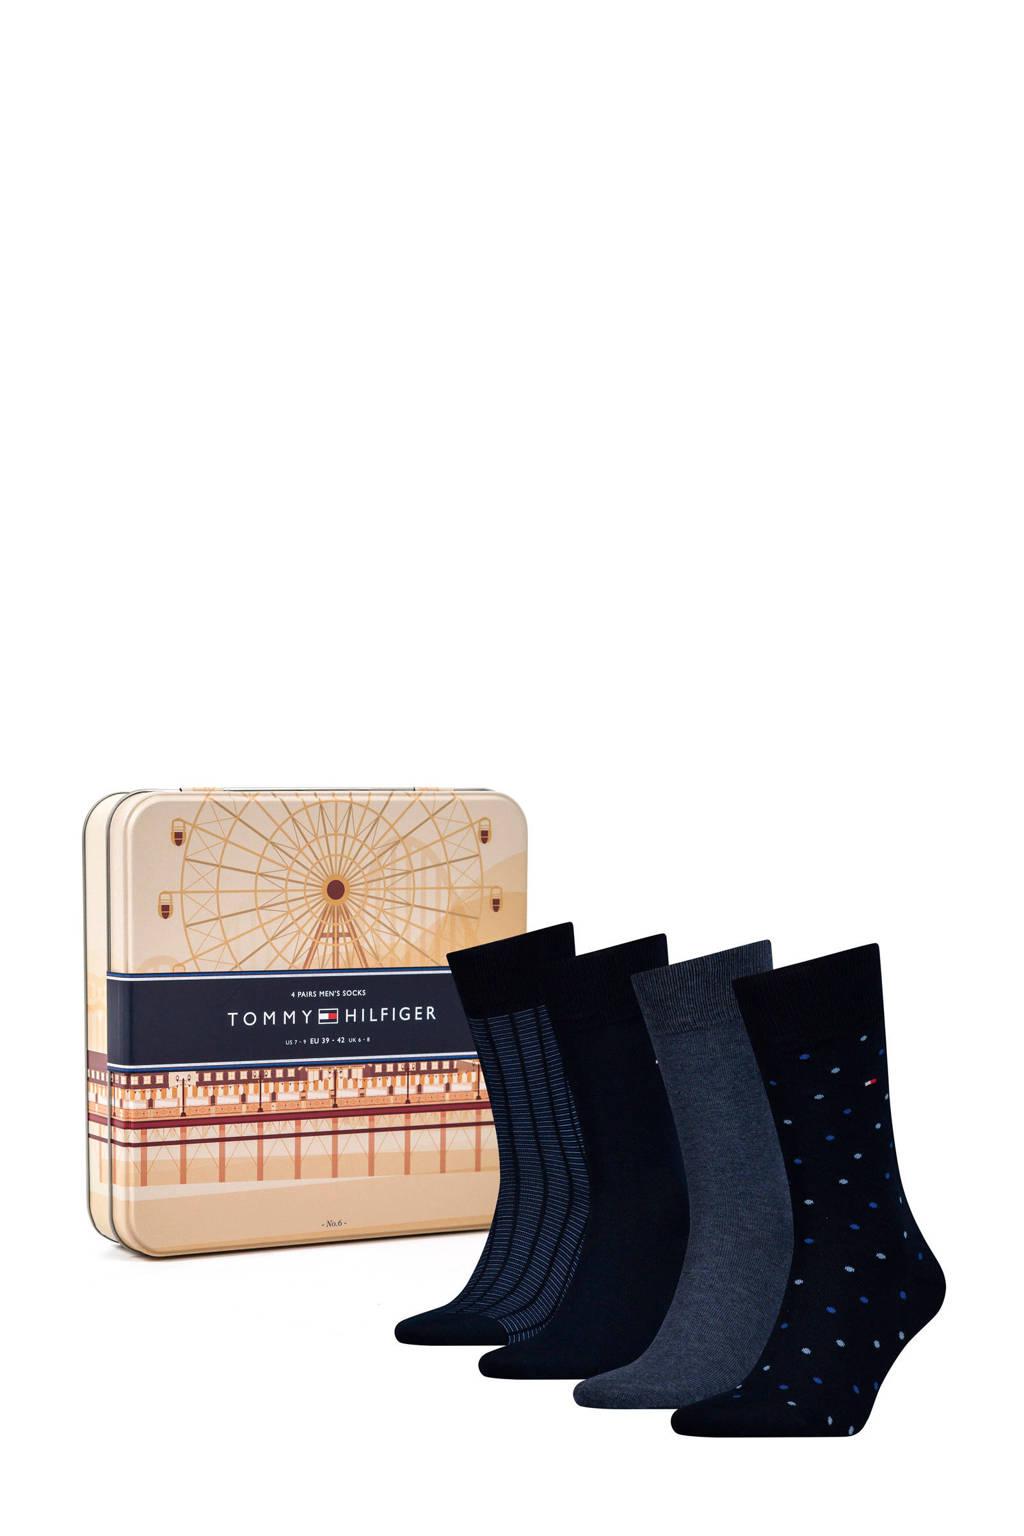 Tommy Hilfiger giftbox sokken (4 paar), Marine